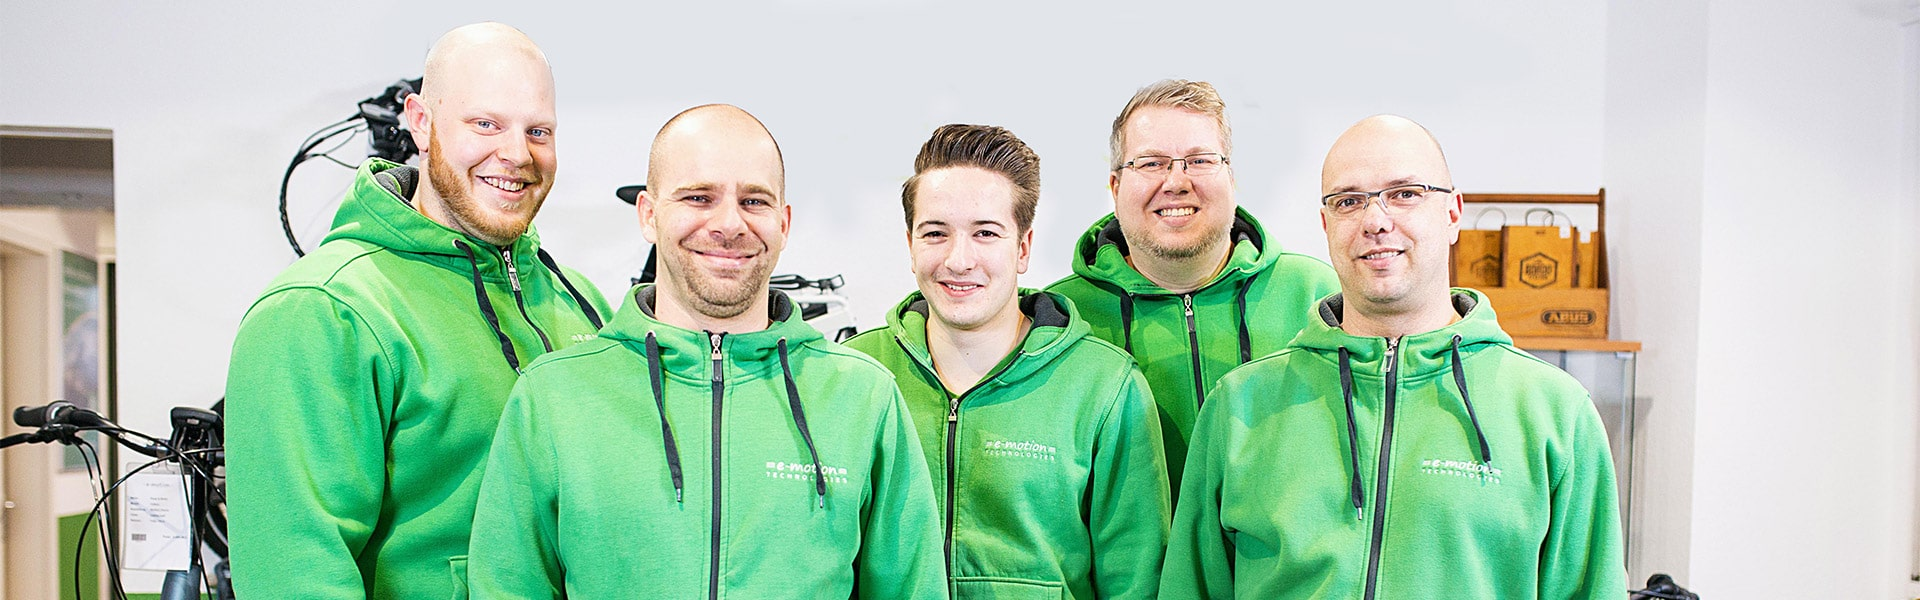 Das Team des e-motion e-Bike Premium-Shop Köln